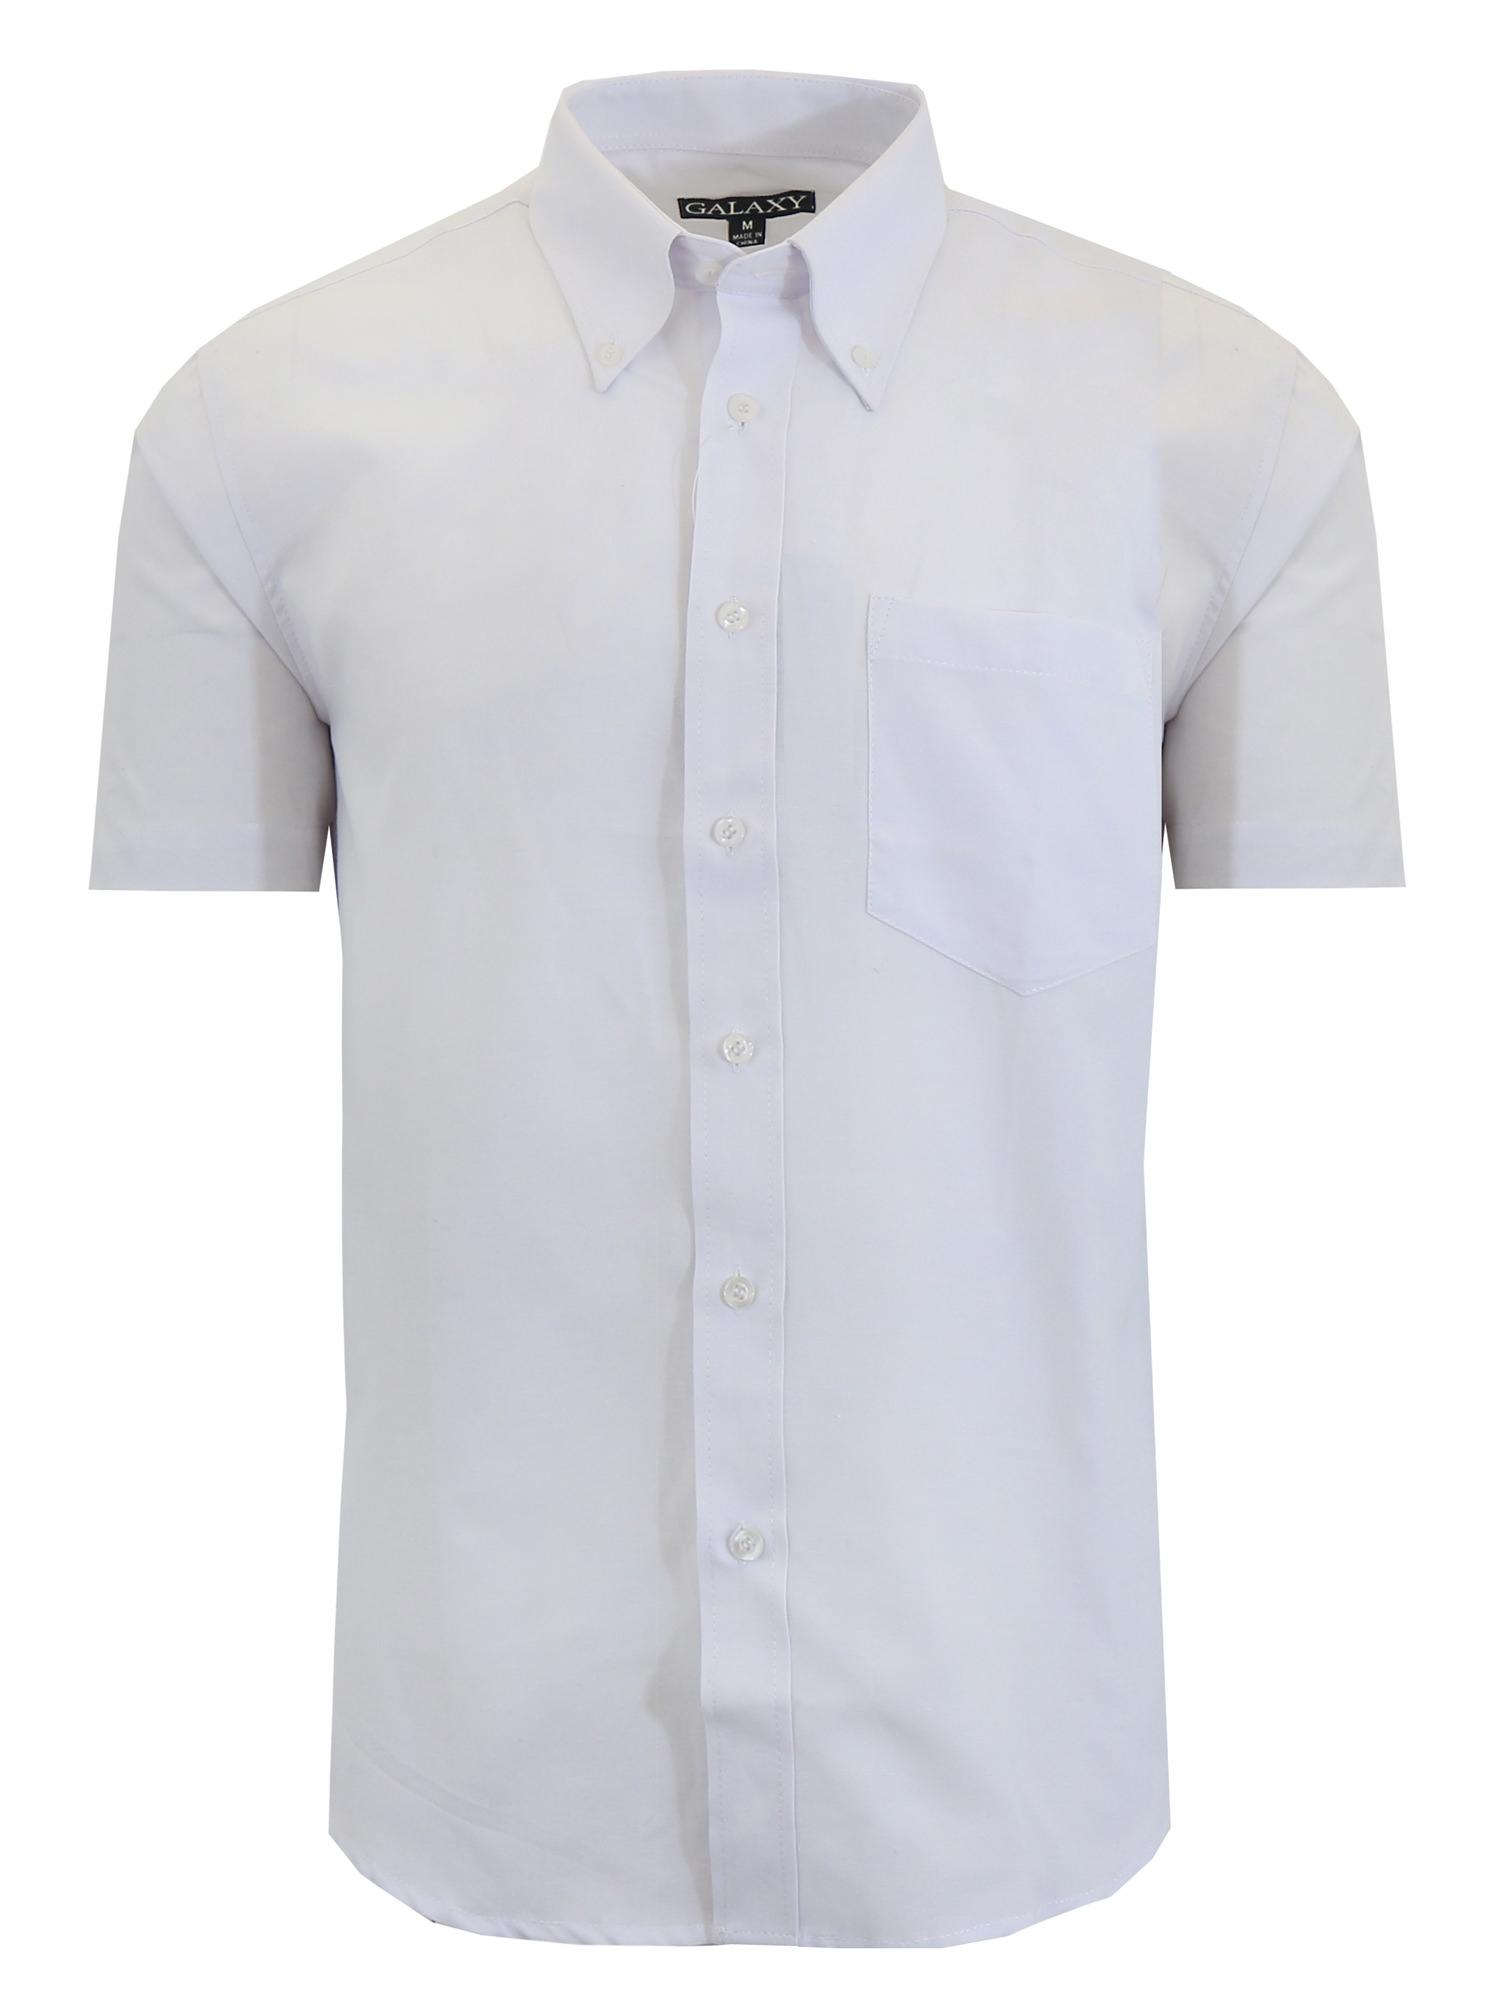 Mens Short Sleeve Oxford Dress Shirt White Casual Button Down